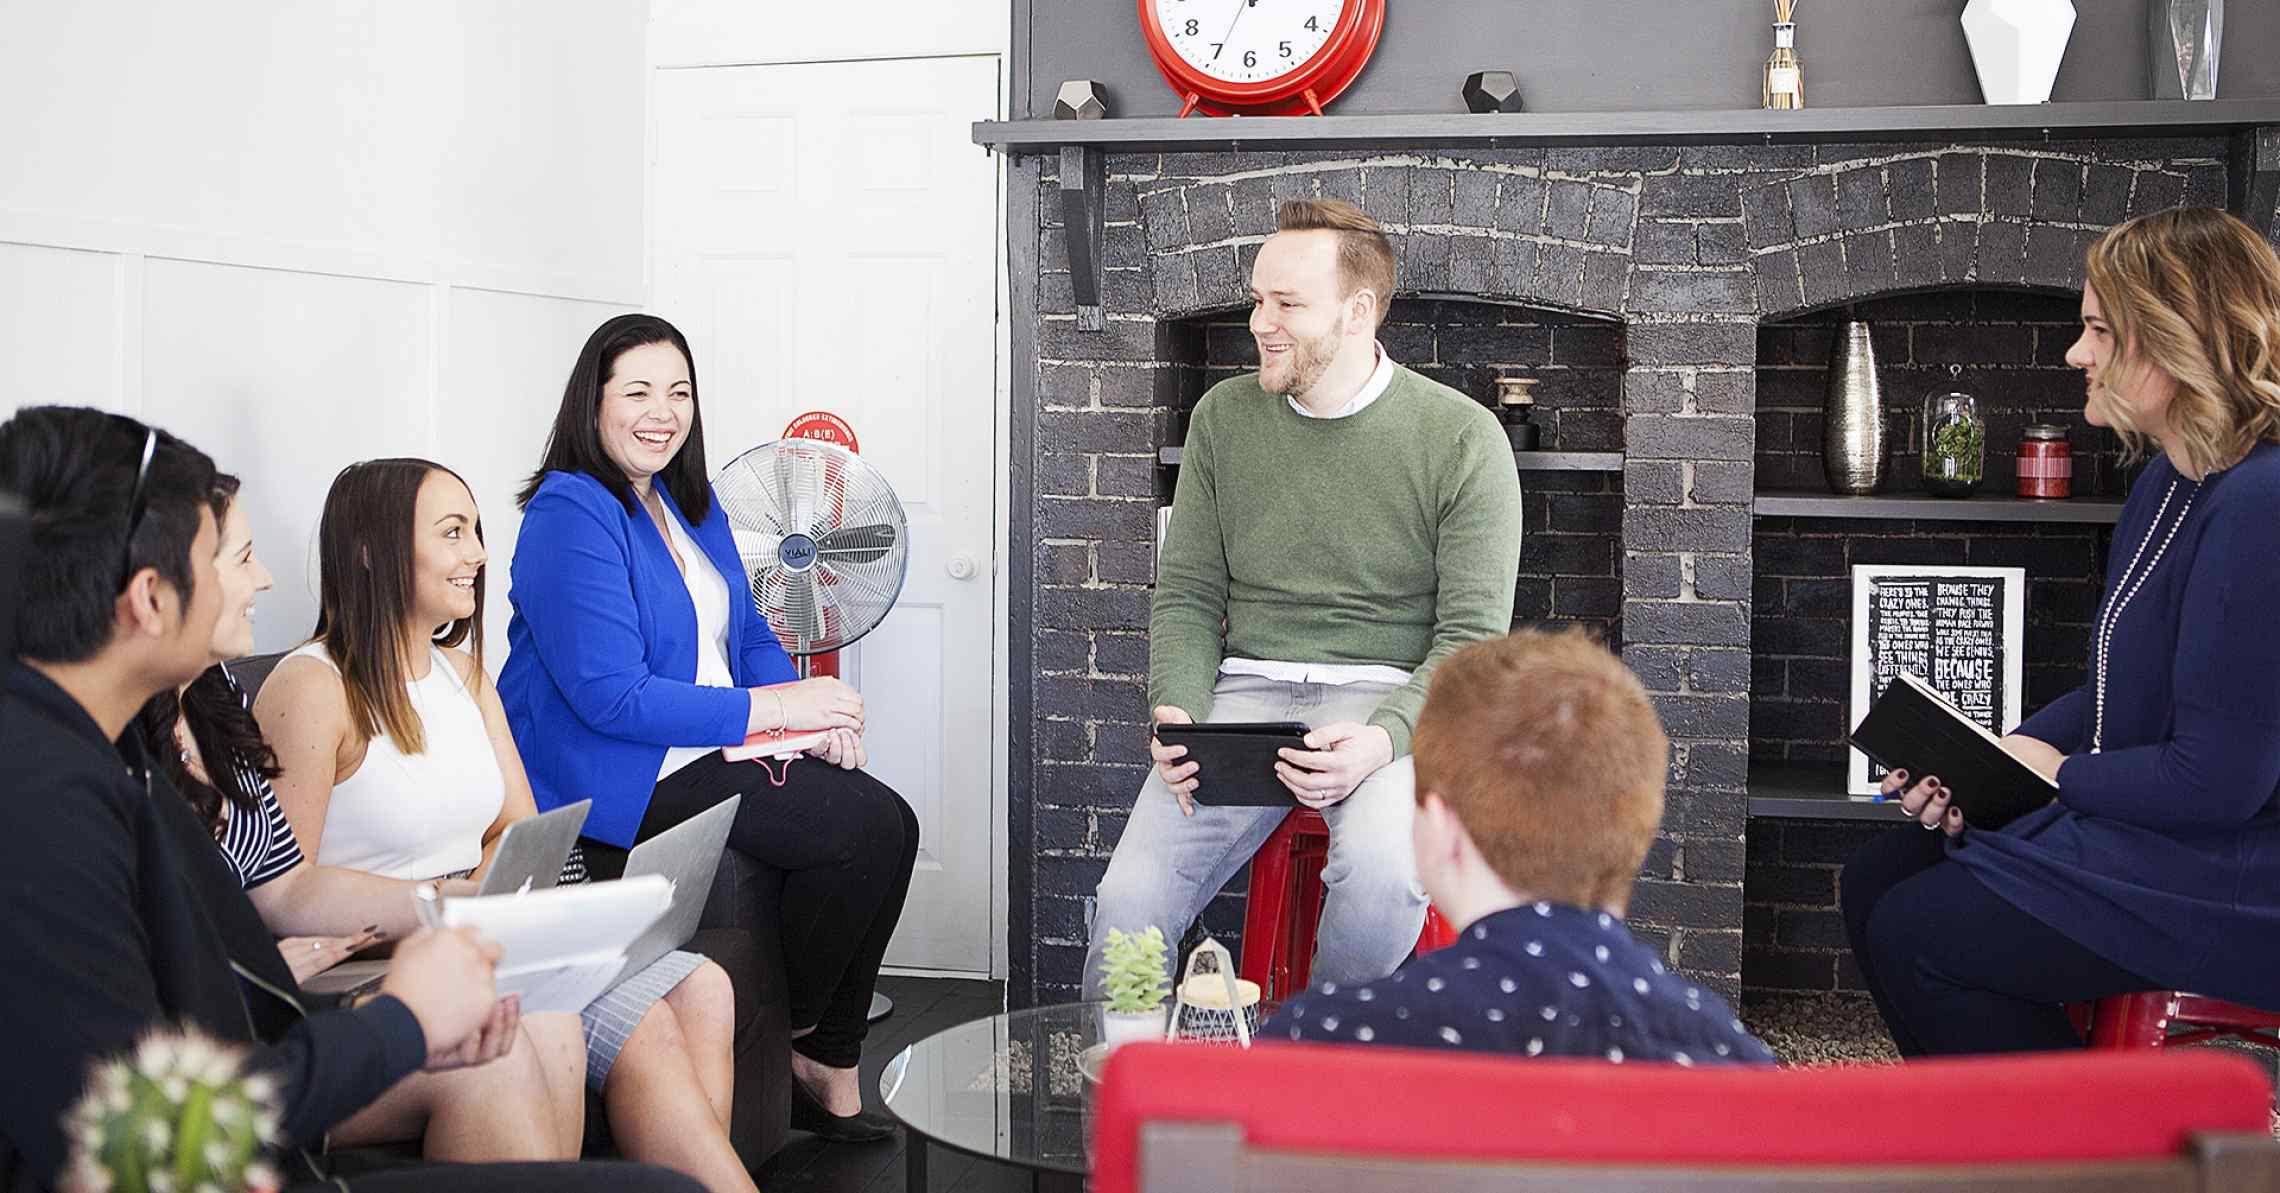 In the News: Bendigo Advertiser Shines the Spotlight on Creative Revolution